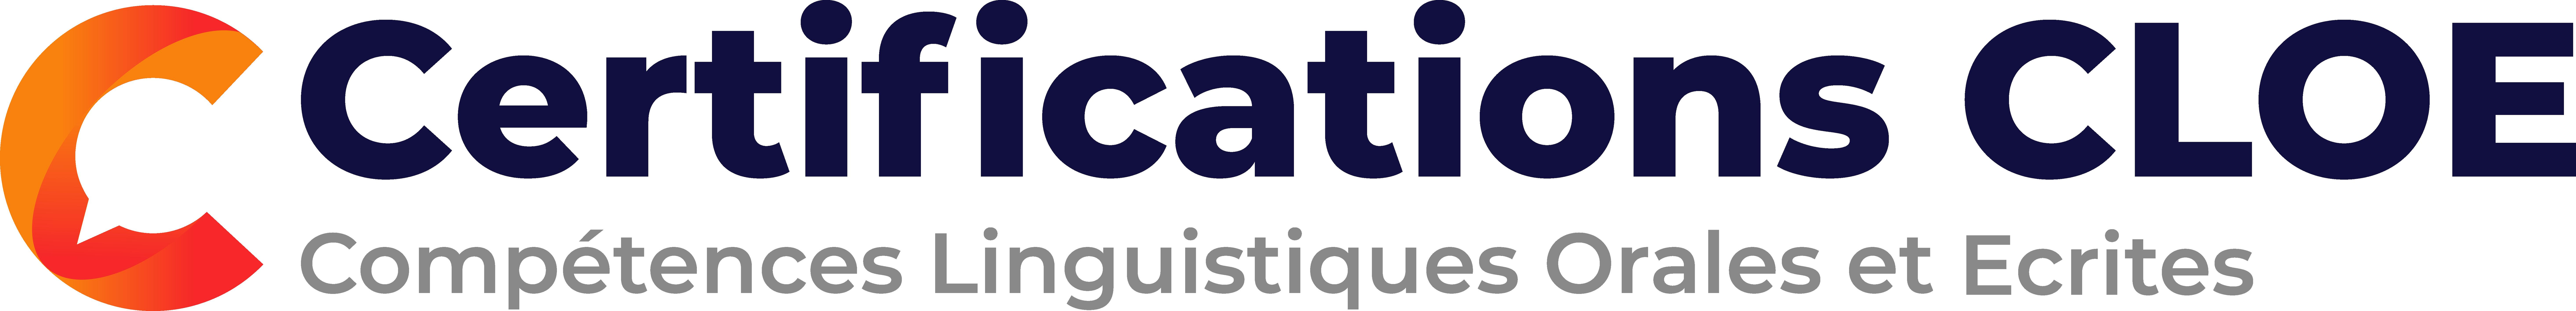 logo-texte-sur-fond-blanc.png